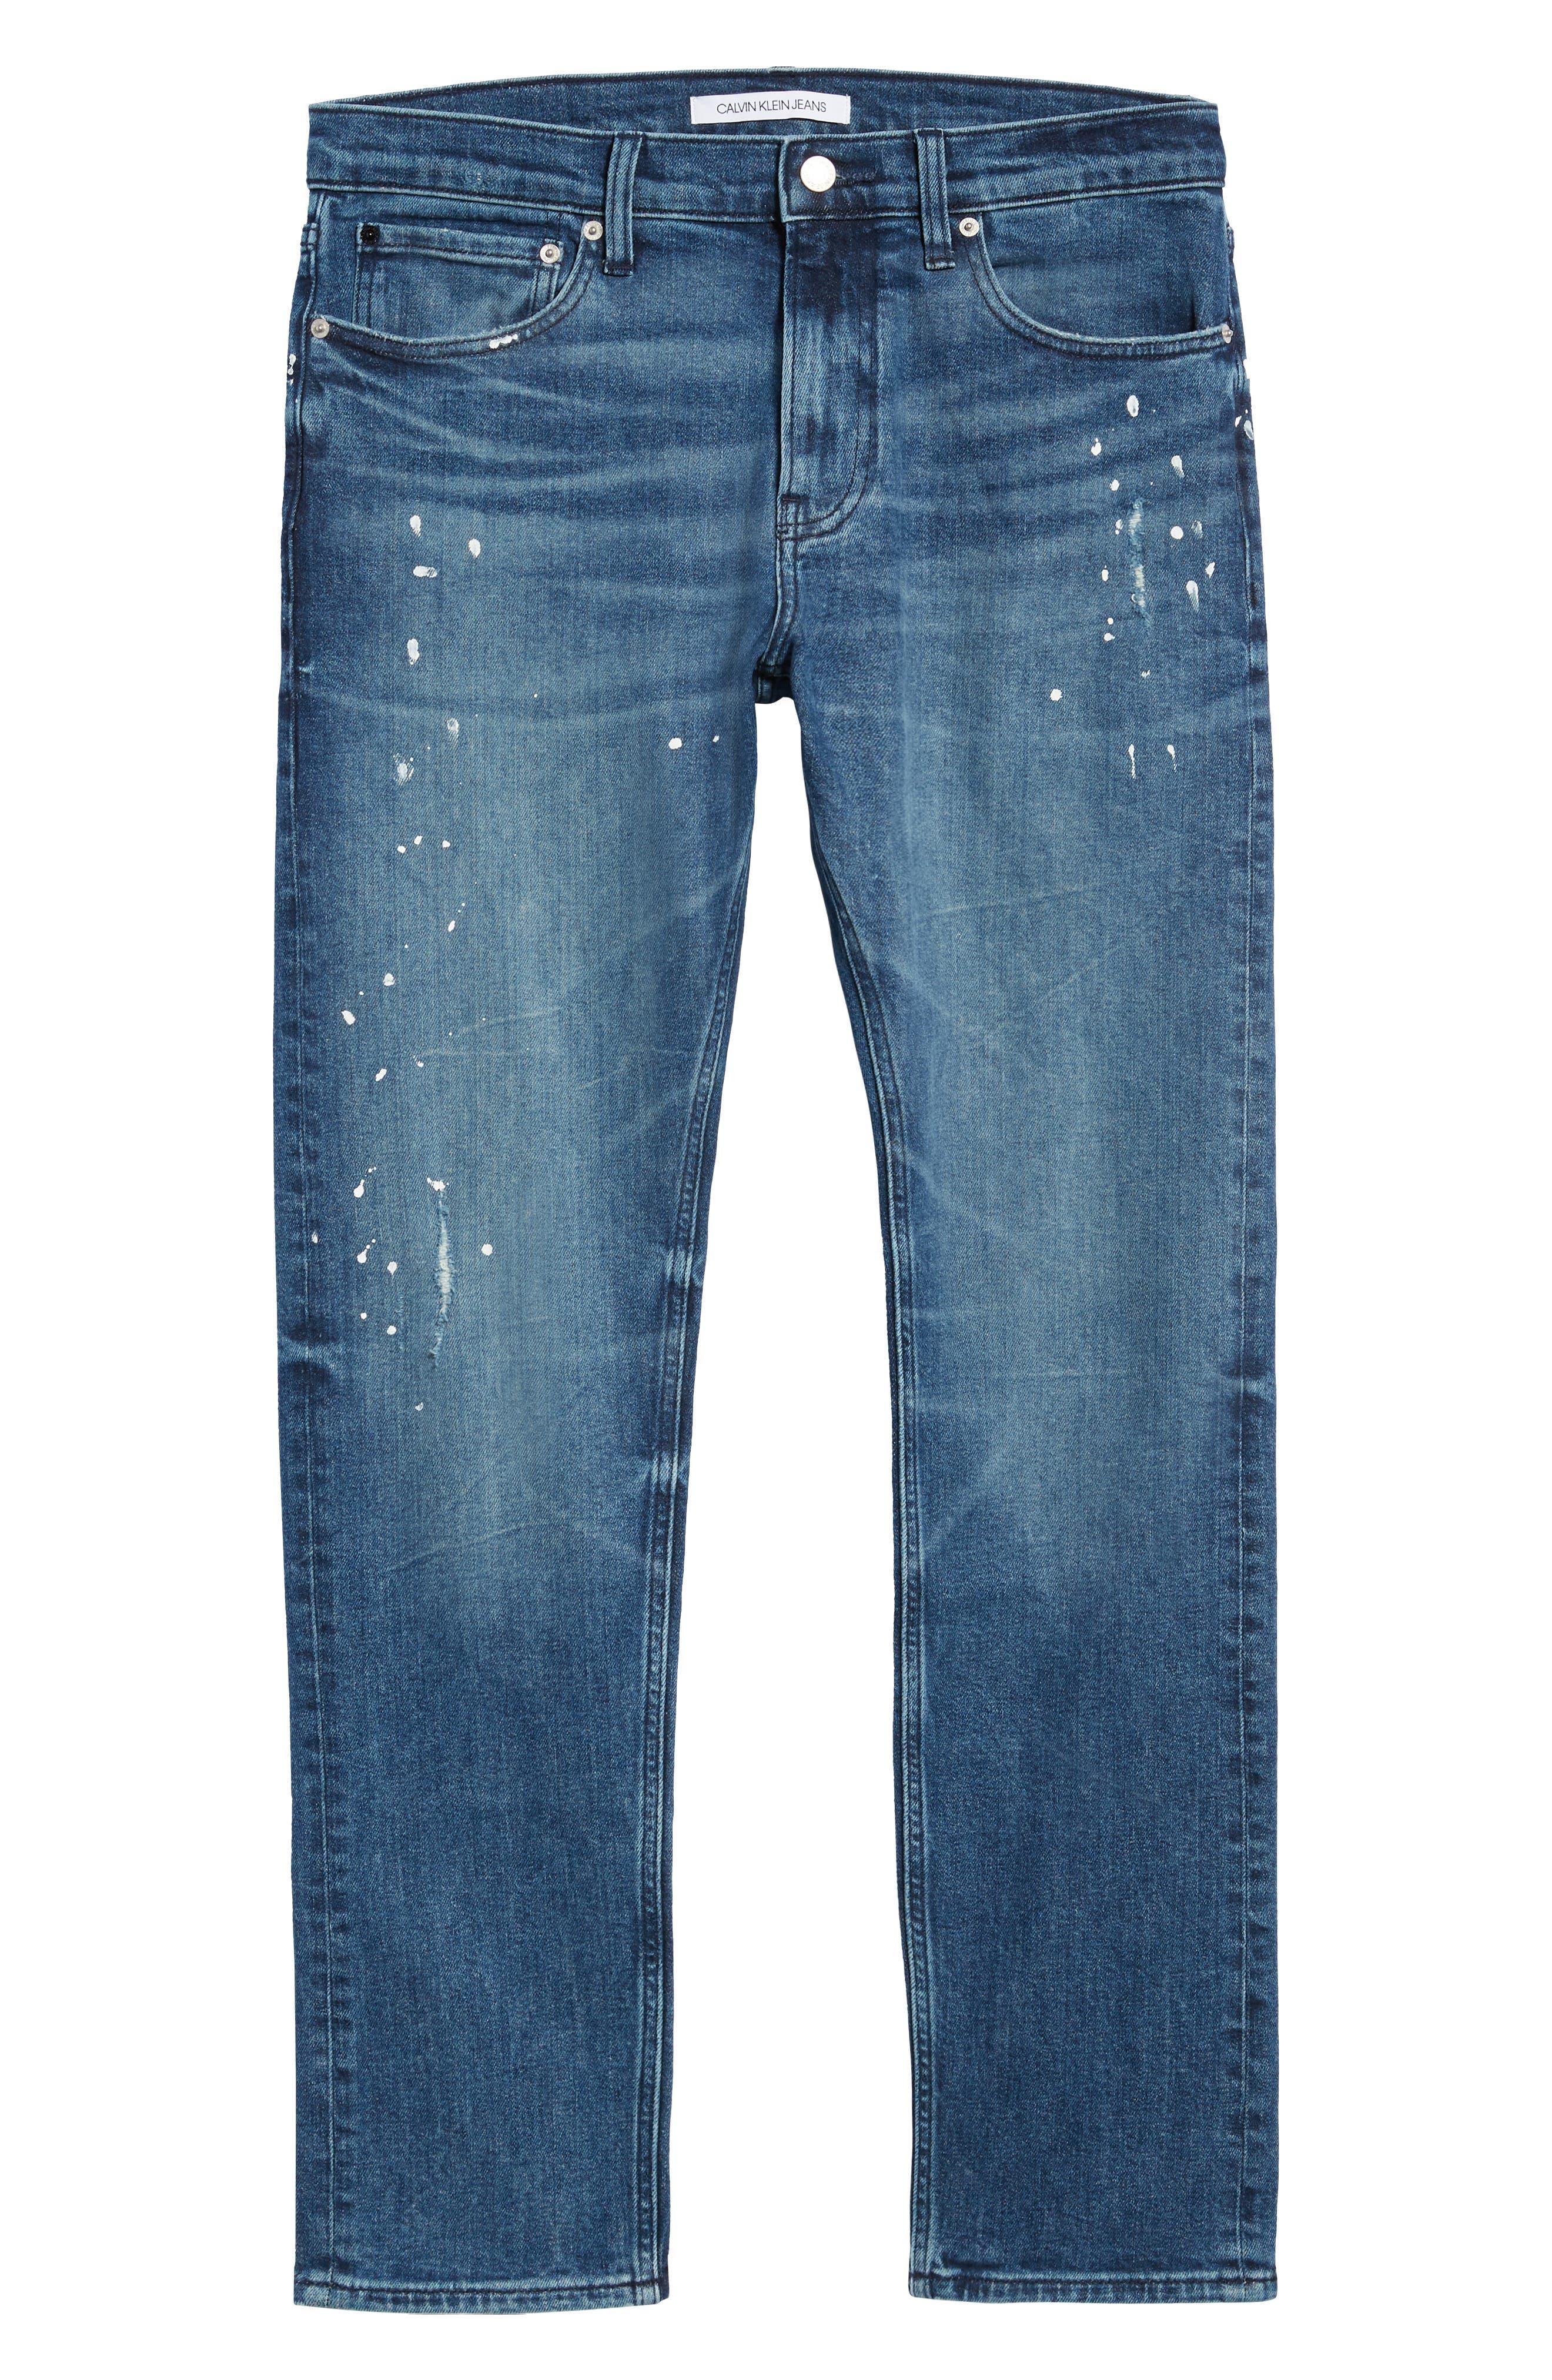 Calvin Klein Slim Fit Jeans,                             Alternate thumbnail 6, color,                             KINGPIN BLUE